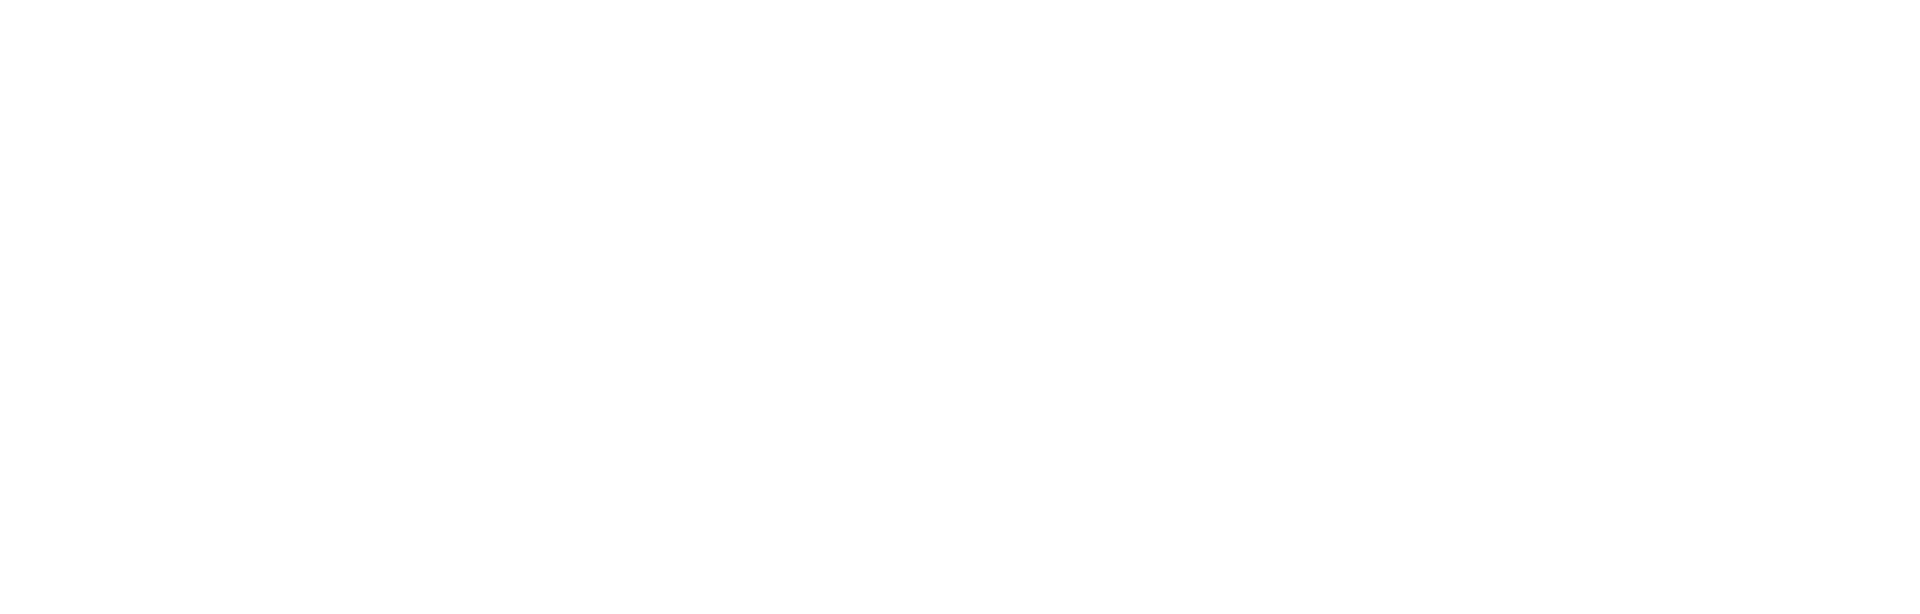 honda_app_titulo